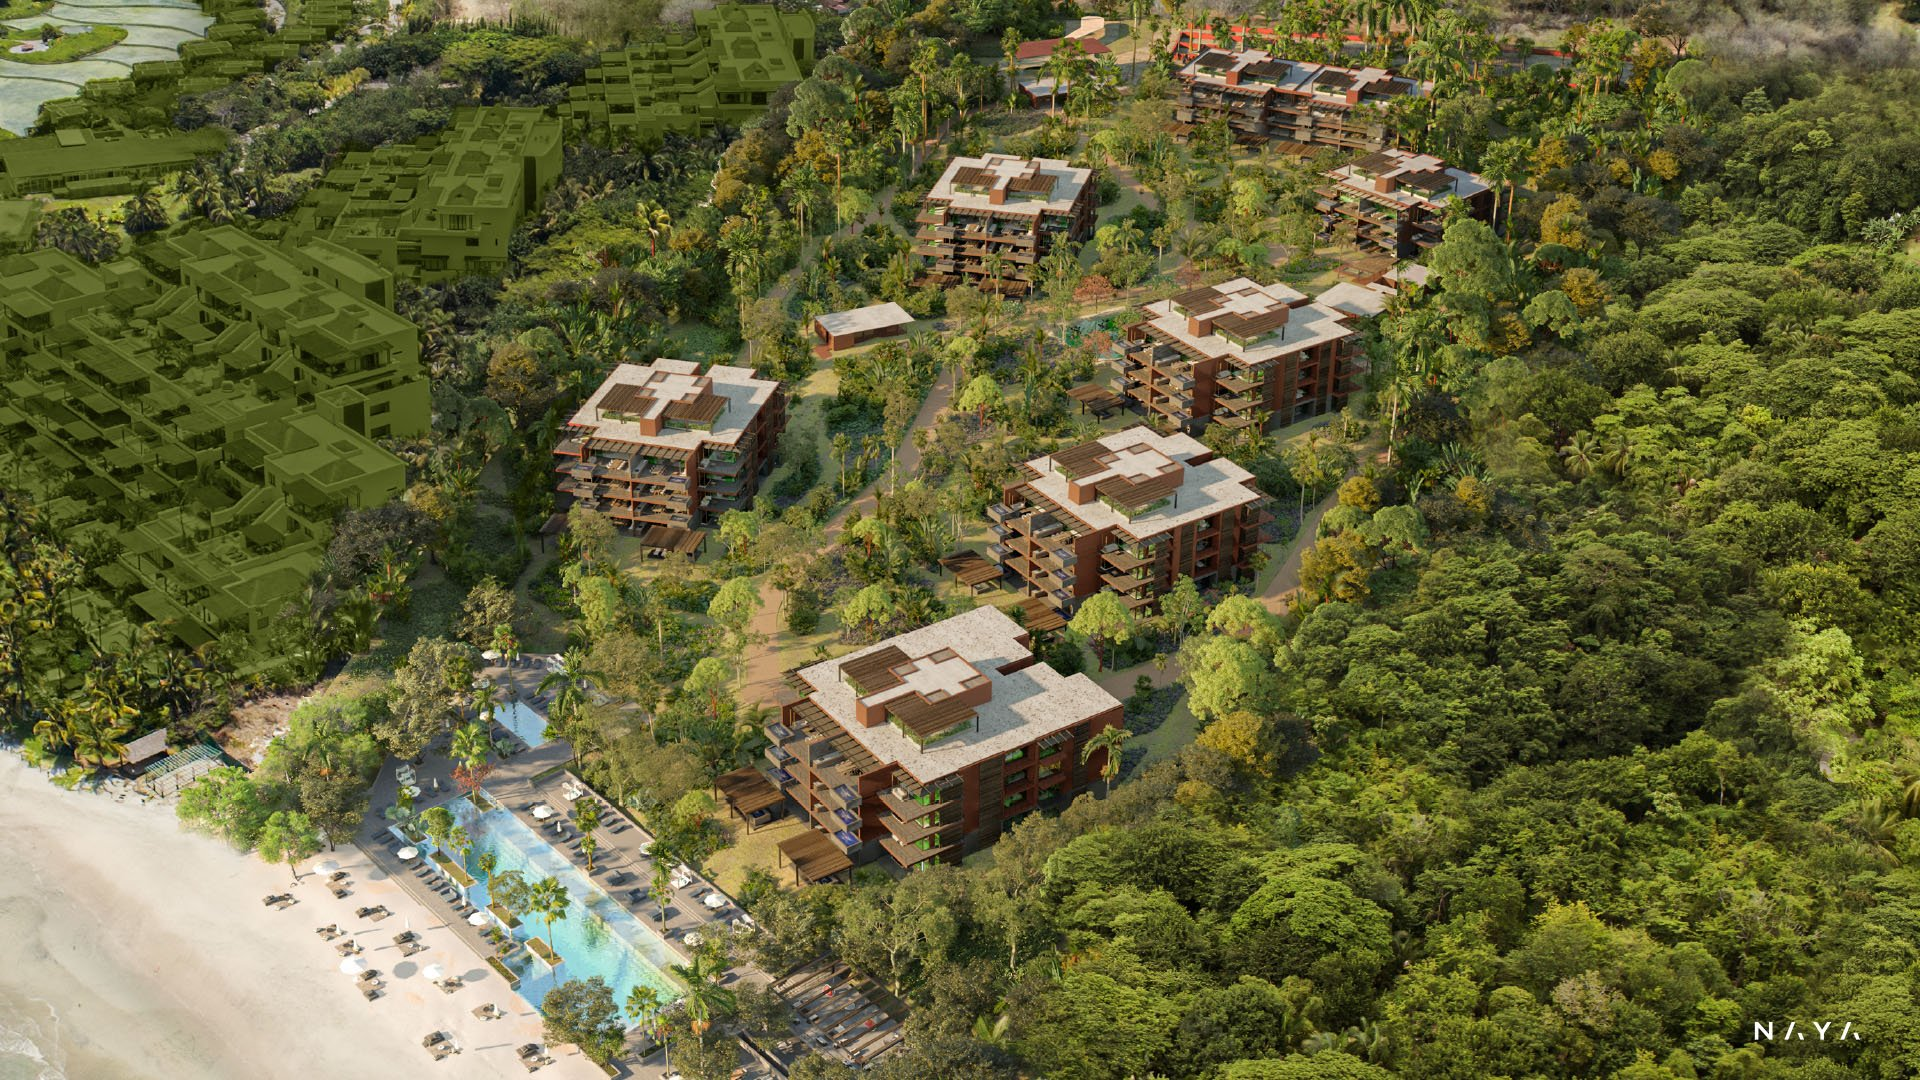 NAYA - Punta de Mita beachfront condos for sale - Riviera Nayarit, Mexico